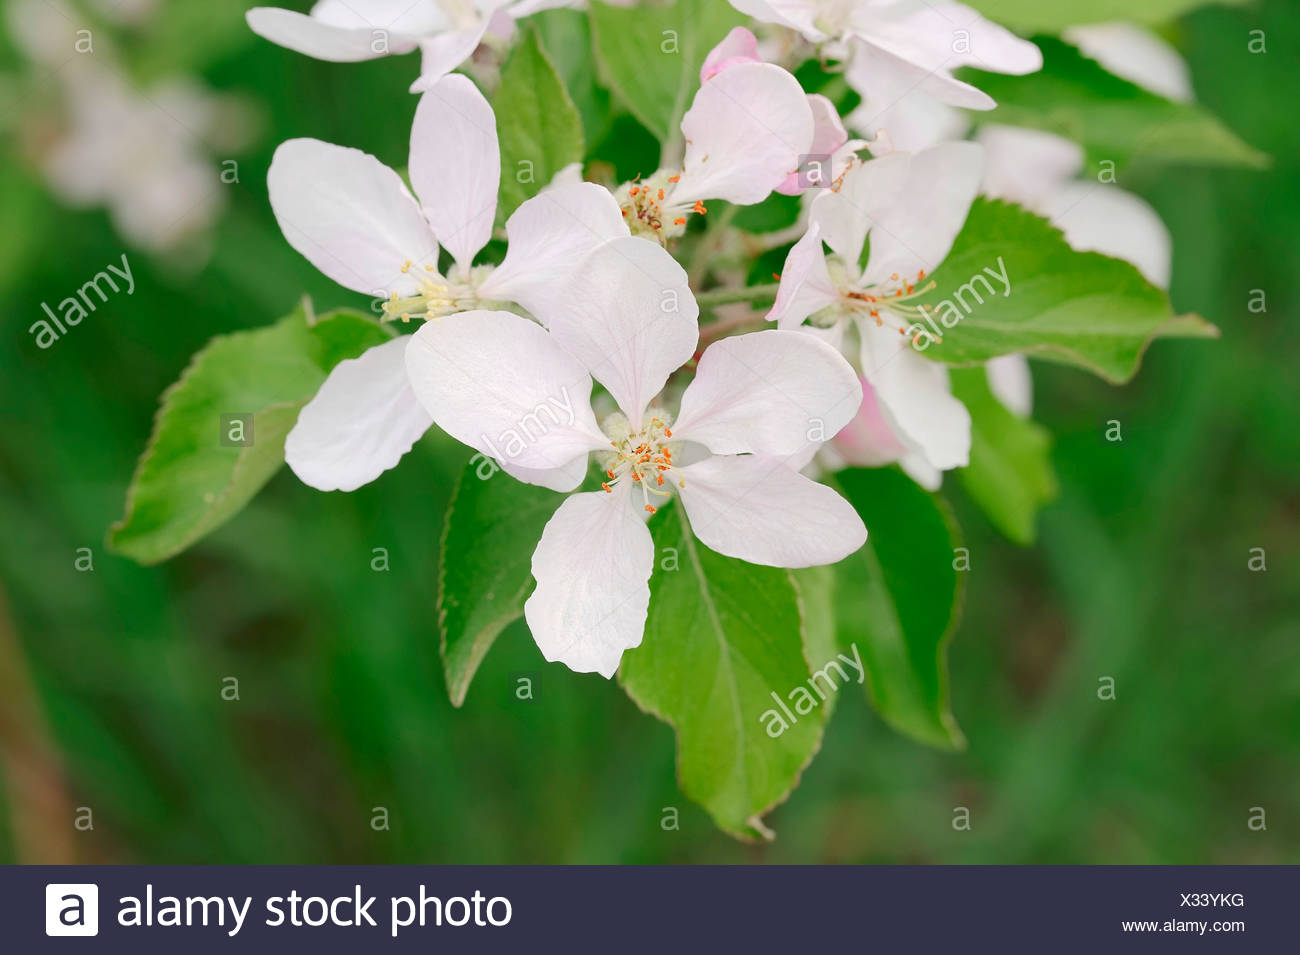 Armenian Plum or Siberian Apricot (Prunus armeniaca), flower, Provence, Southern France, France - Stock Image